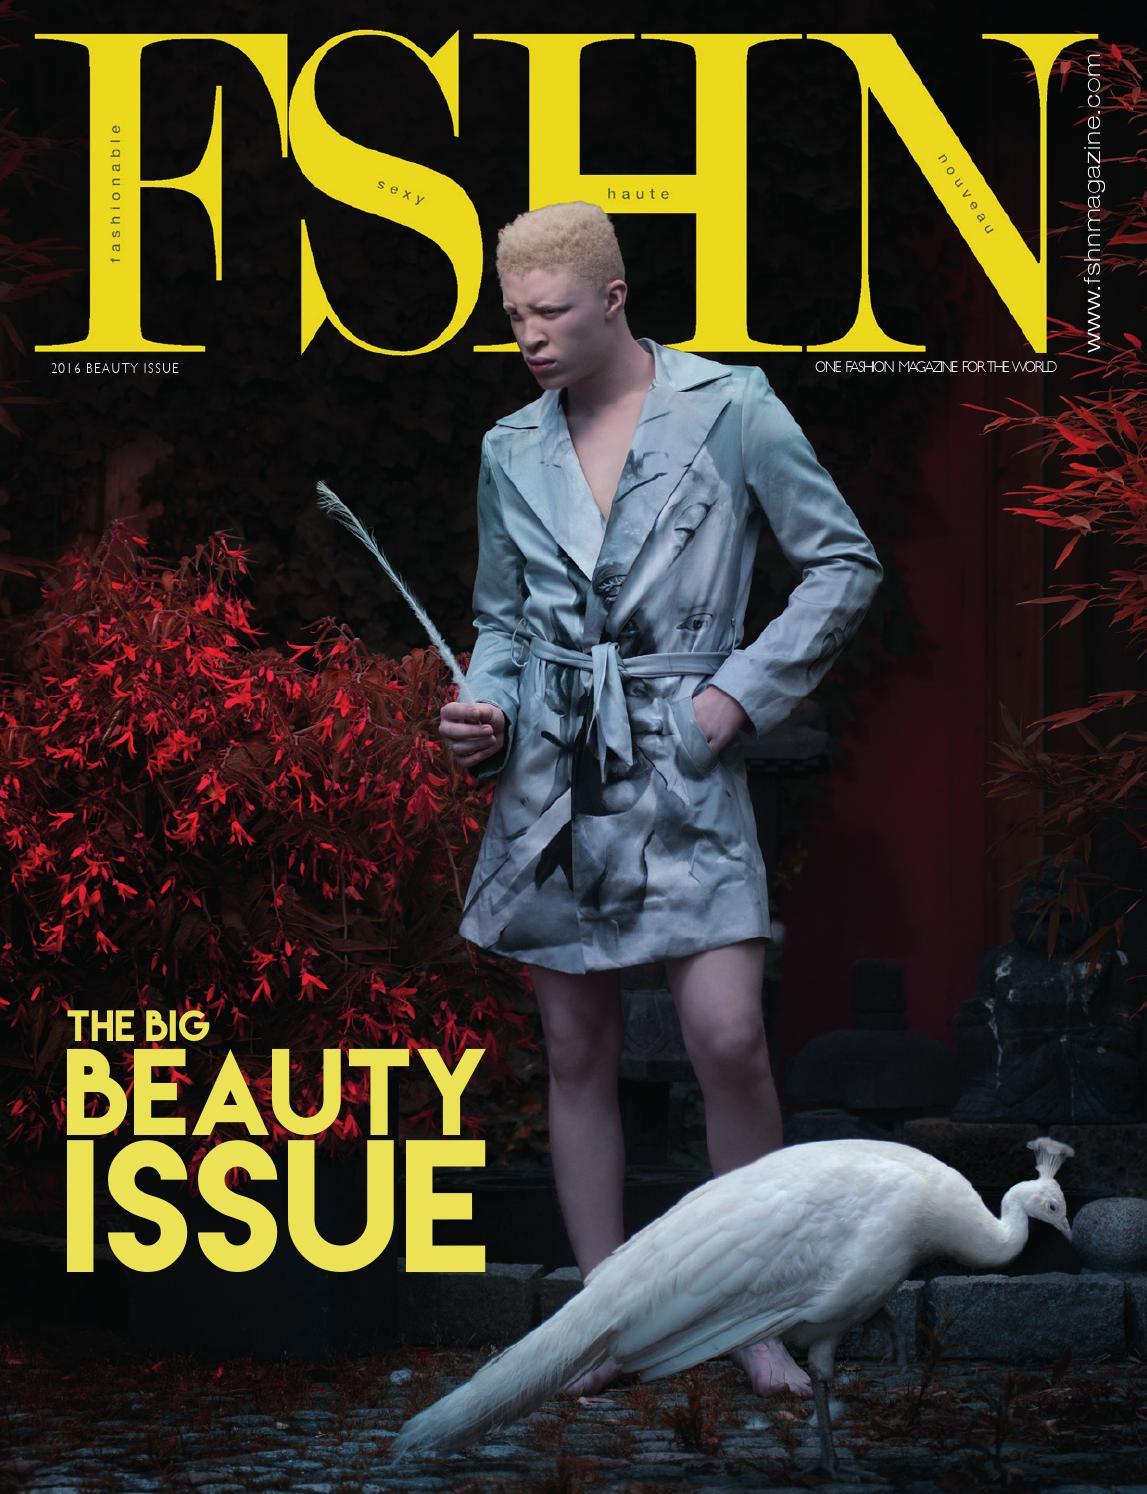 Fshn magazine // summer fashion issue 2016 by fshn magazine   issuu